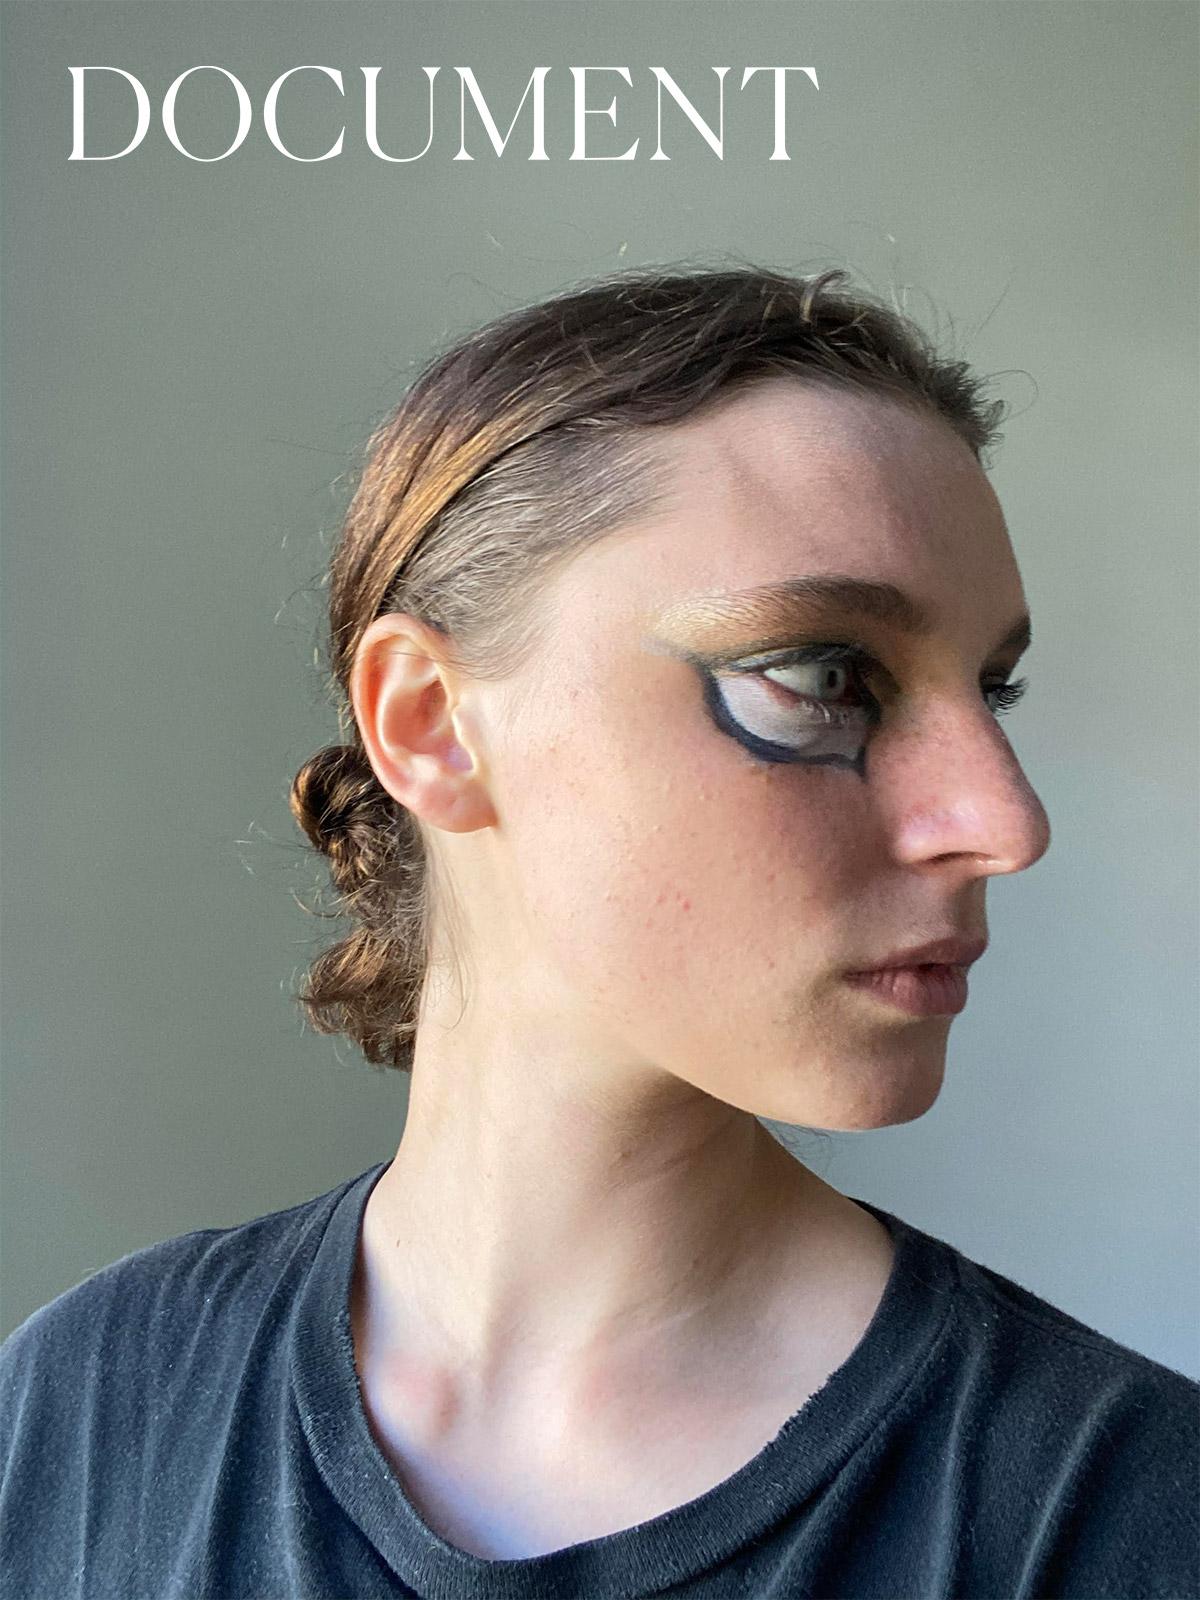 Watch Ansley Gulielmi morph into a modern-day Veruschka